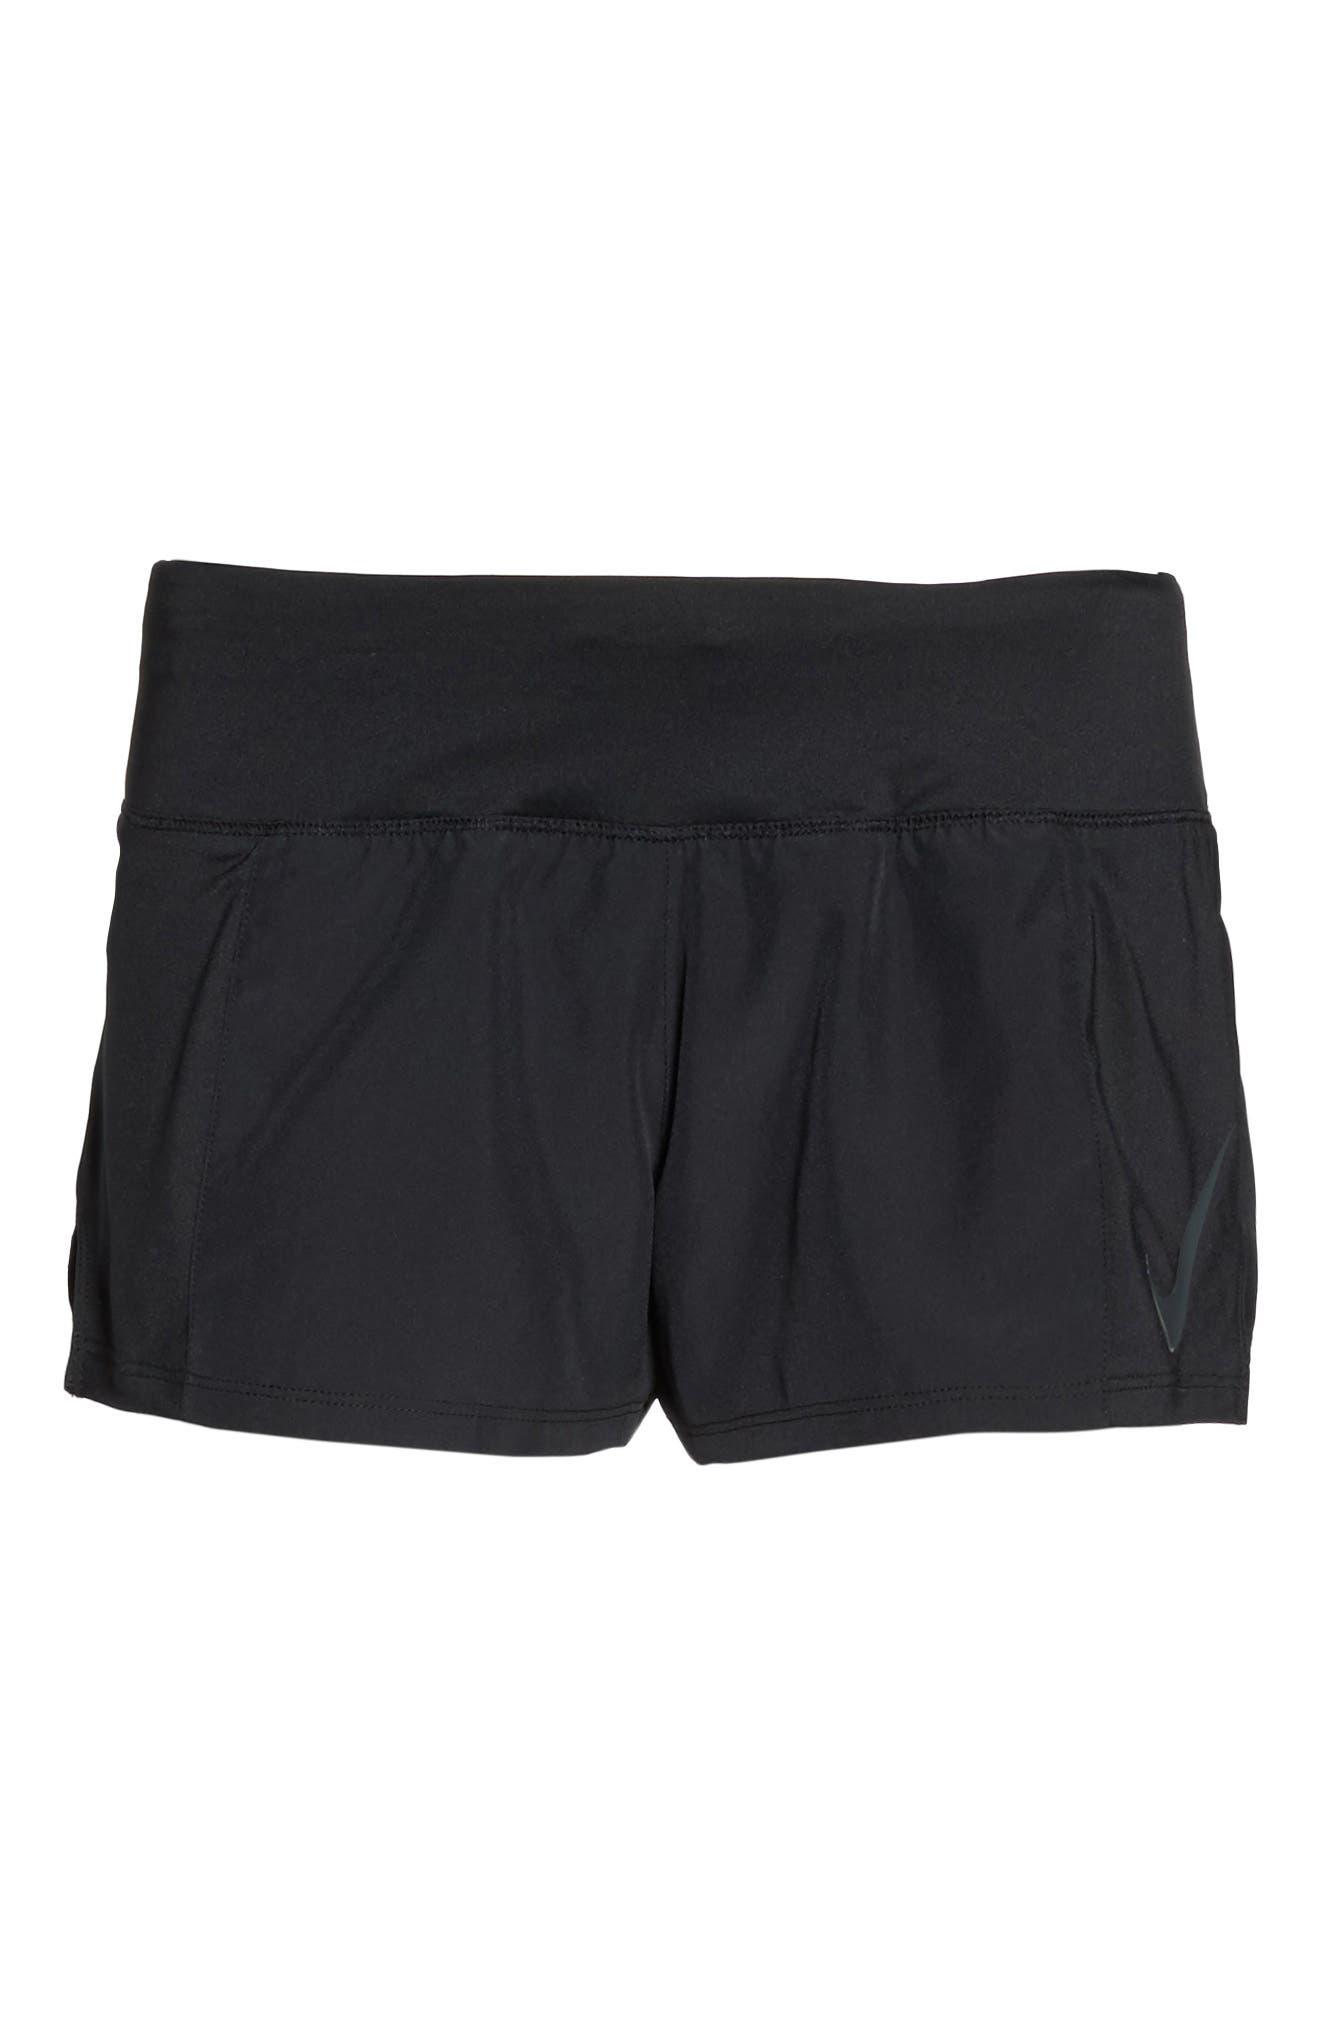 Dry Crew Running Shorts,                             Alternate thumbnail 6, color,                             010